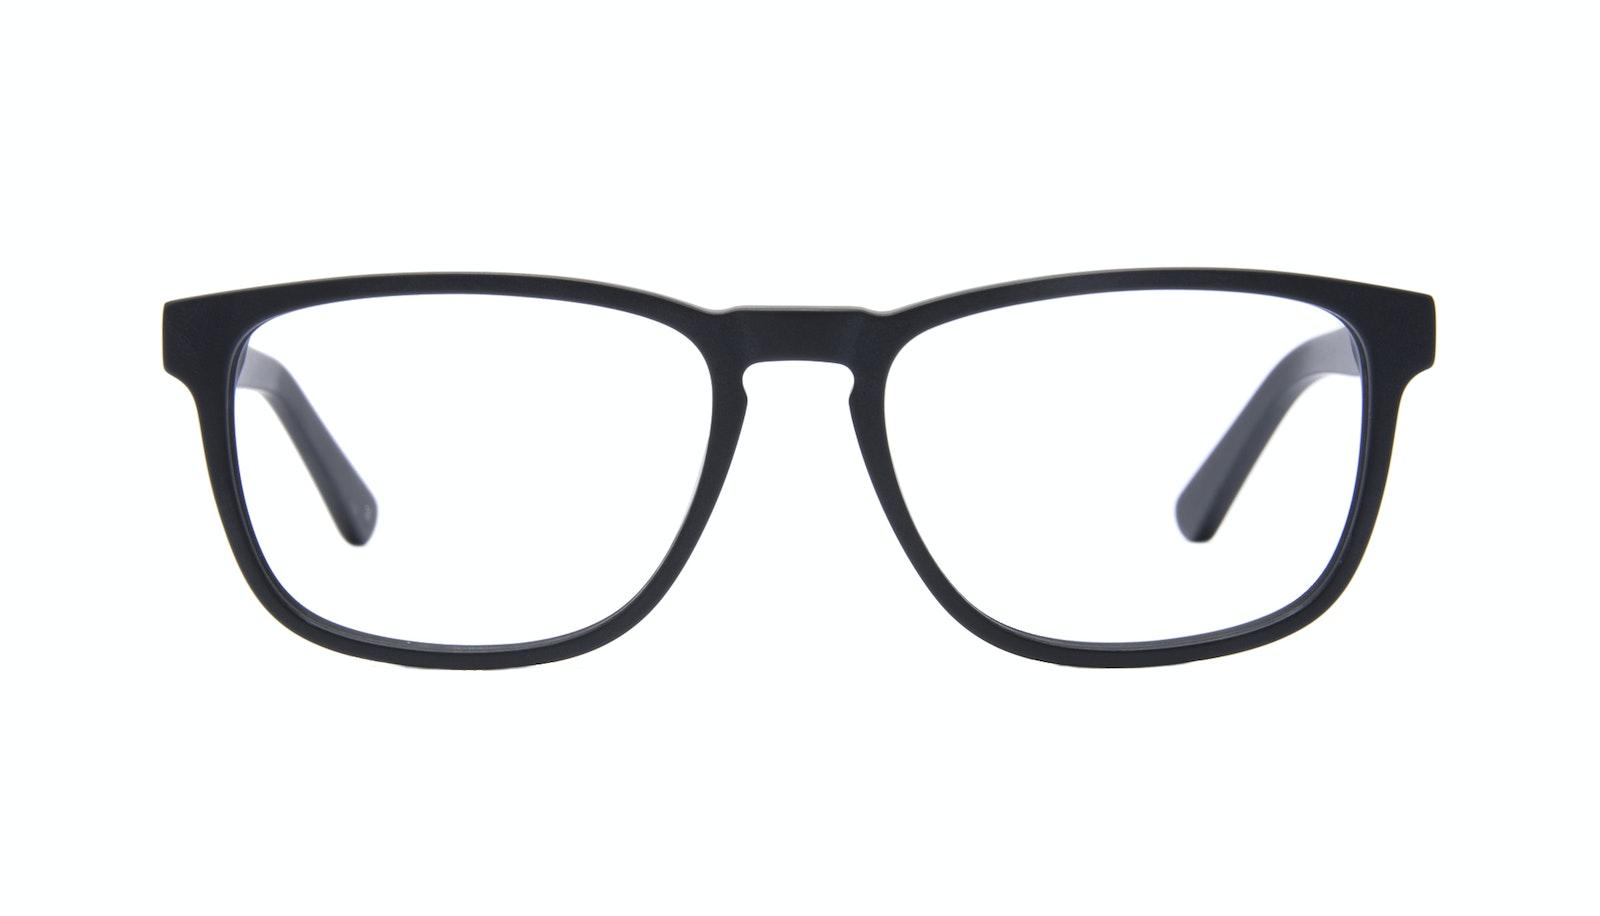 Affordable Fashion Glasses Rectangle Eyeglasses Men Loft Black Matte